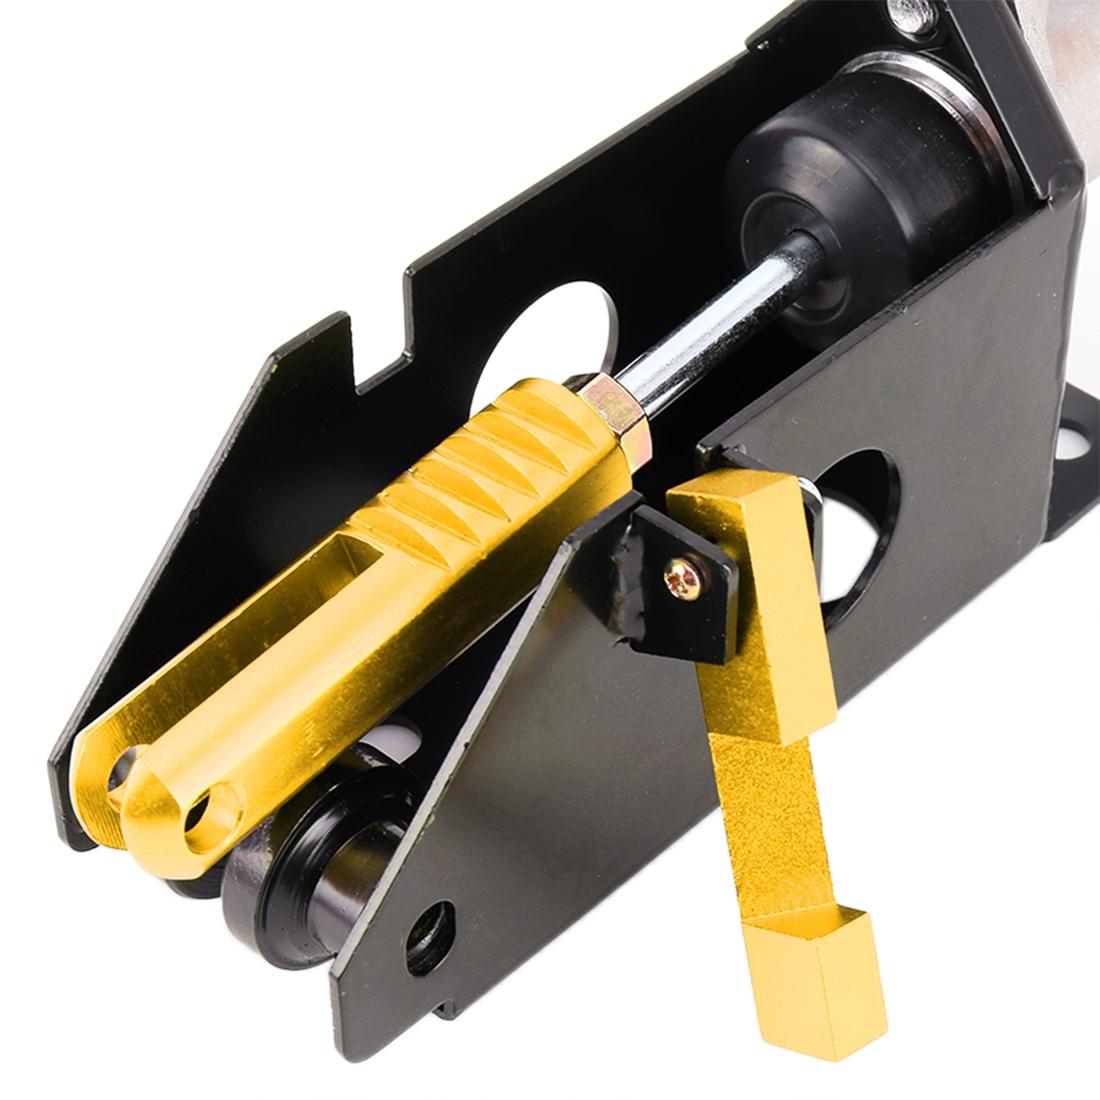 Racing Hydraulic Drift Handbrake Vertical Lever Long Handle Locking Device Hydraulic Drift Brake